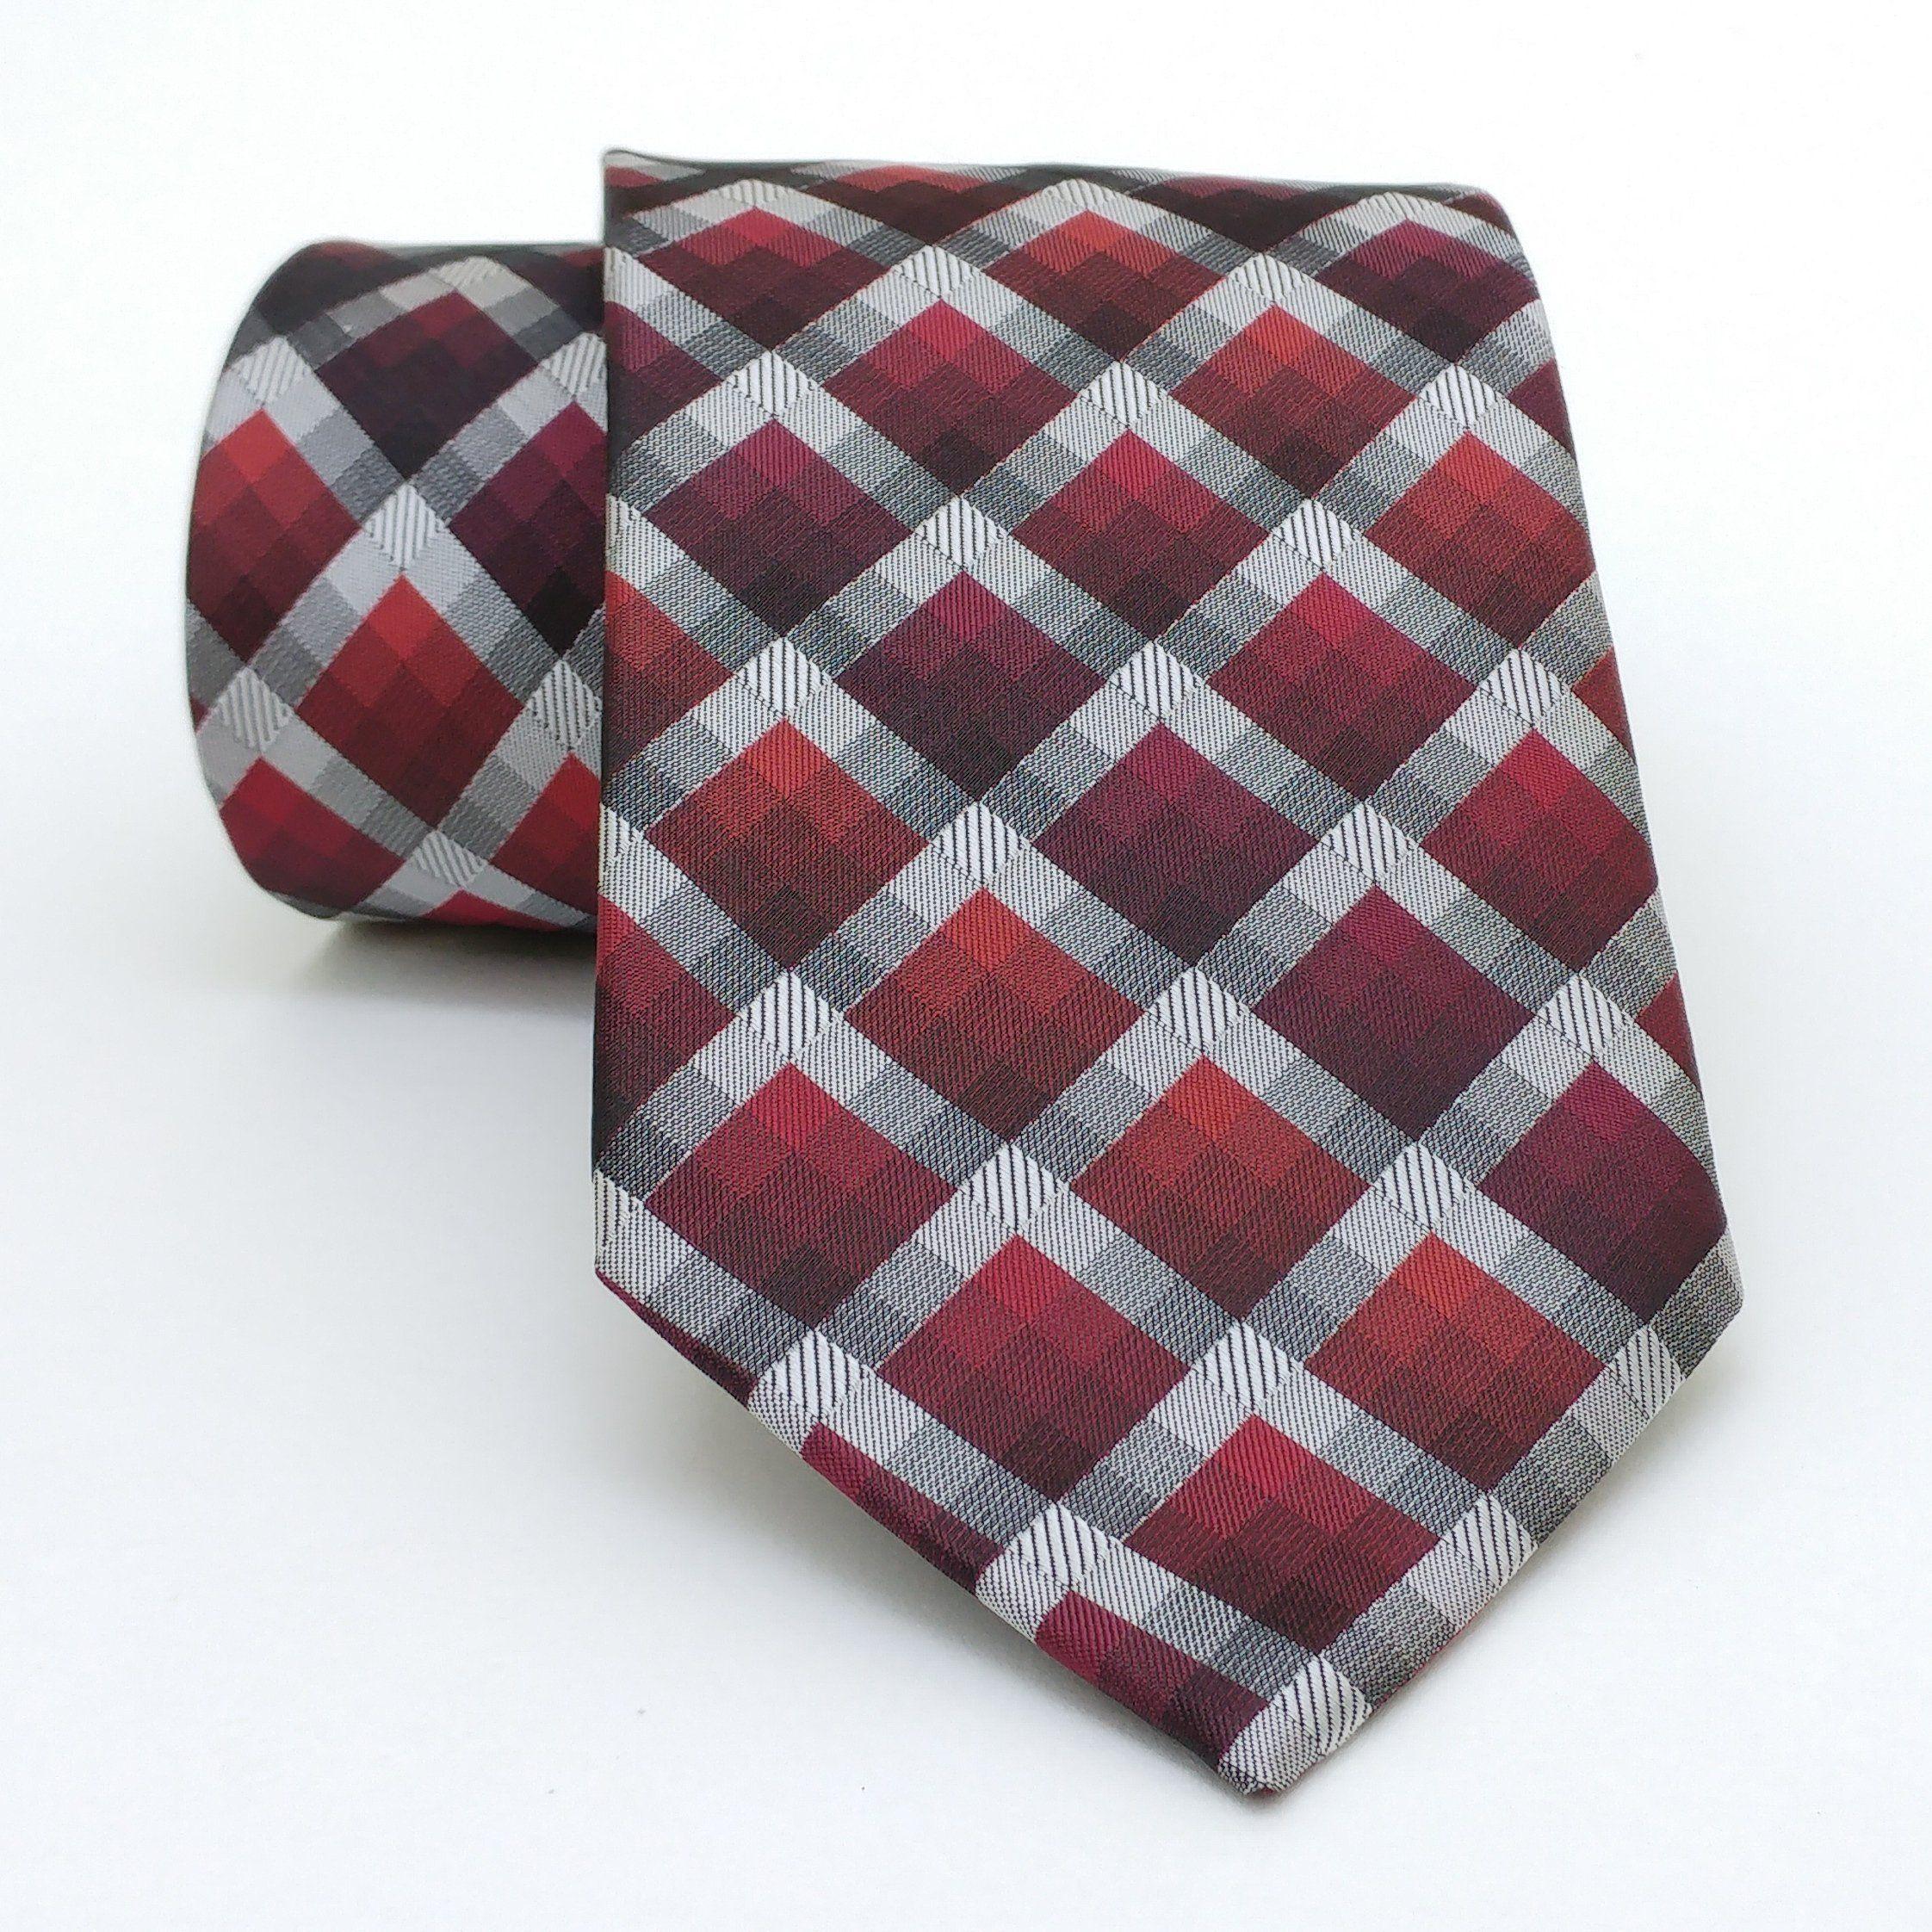 "Claret red and gray plaid men's tie 8 cm (3,15"") DK-112. Claret red and grey plaid men's necktie DK-112 Width : 8 cm (3,15"") Length : 150 cm (59,06"")."